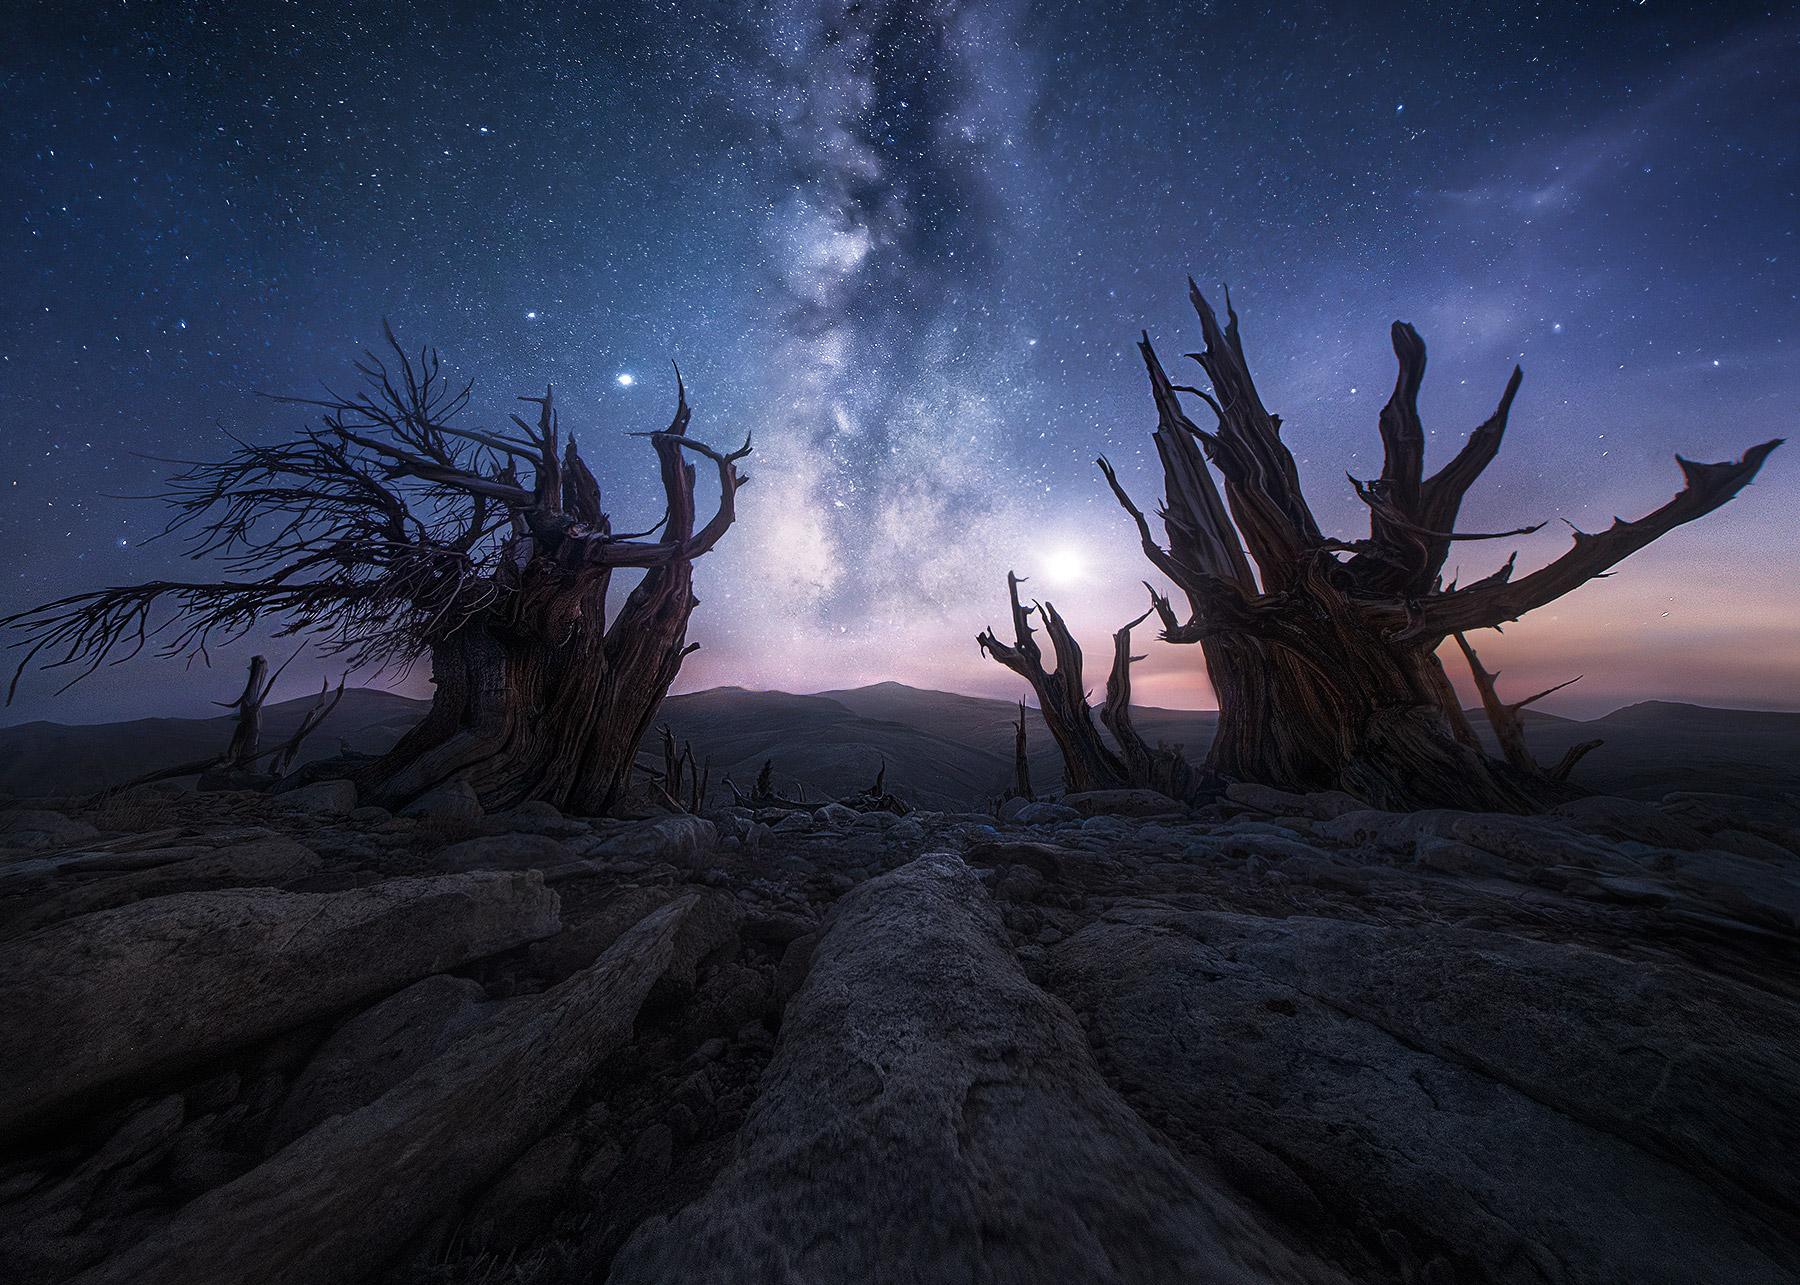 bristlecone, saturn, moon, Jupiter, night, Milky Way, California, photo